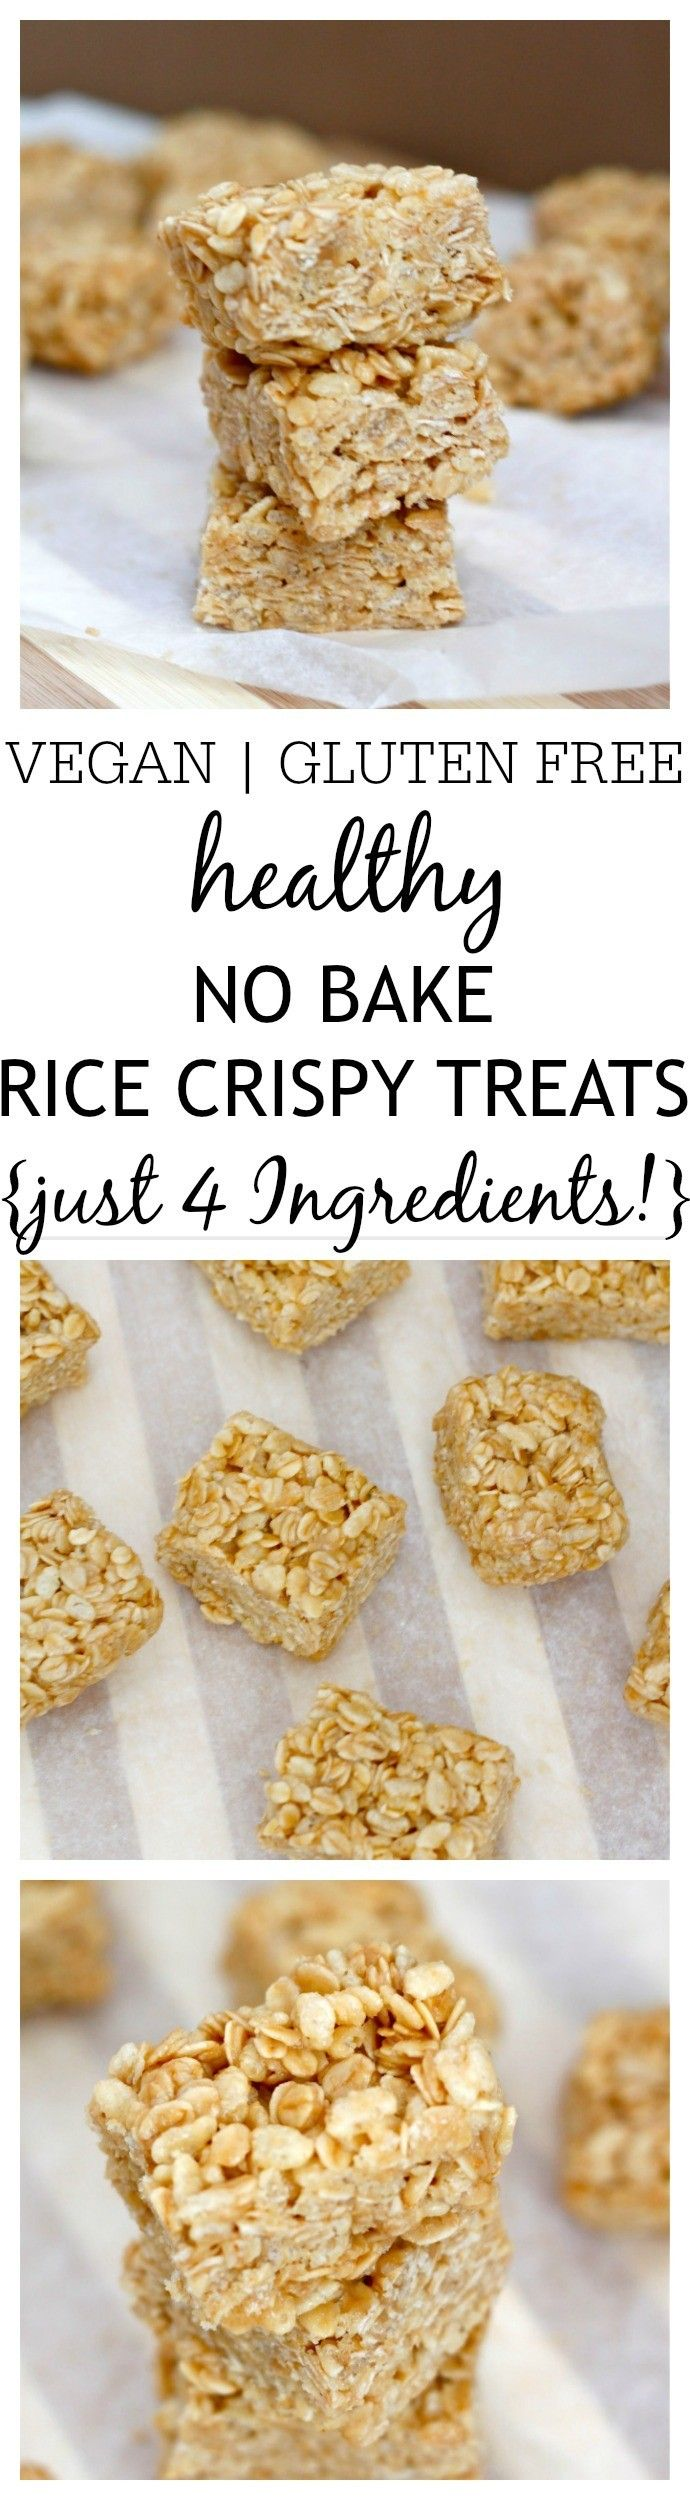 Healthy 4 Ingredient No Bake Rice Crispy Treats! Vegan and gluten-free!